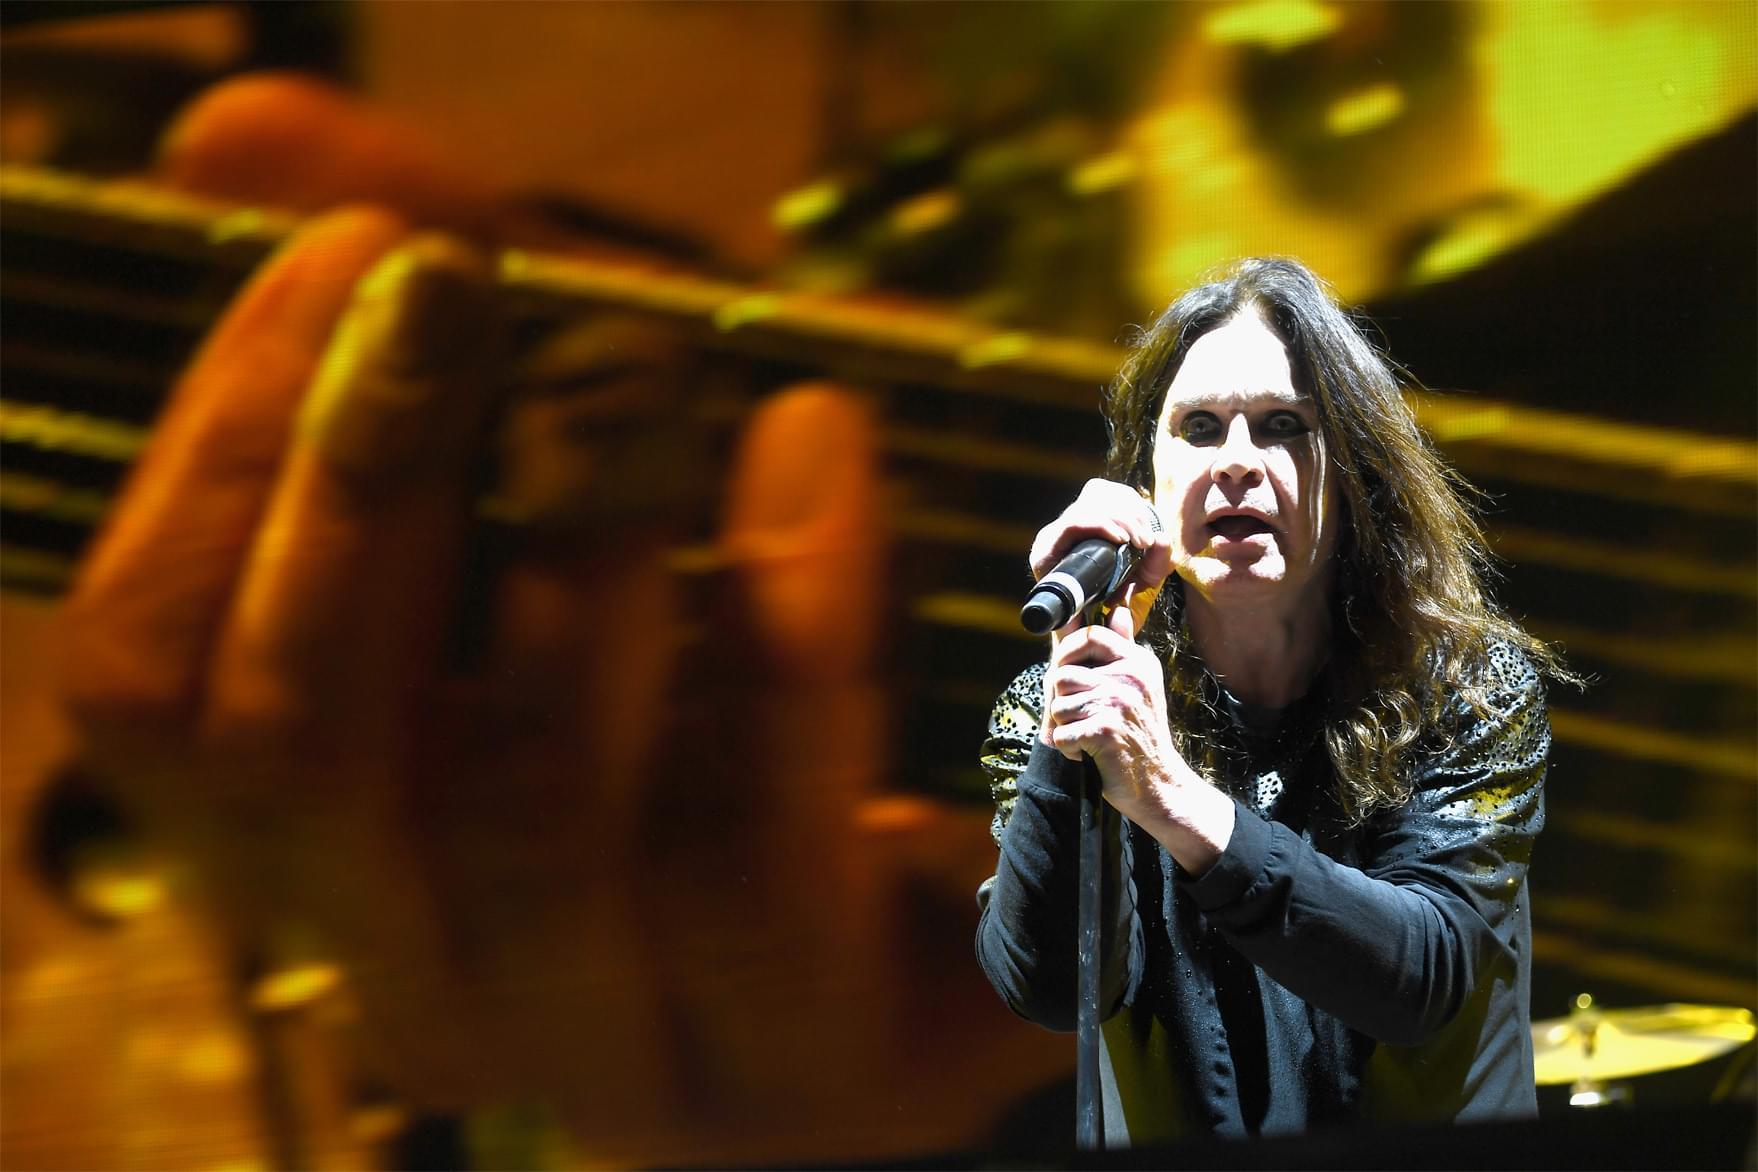 Ozzy Osbourne releases anniversary debut album 'Blizzard Of Ozz' TODAY